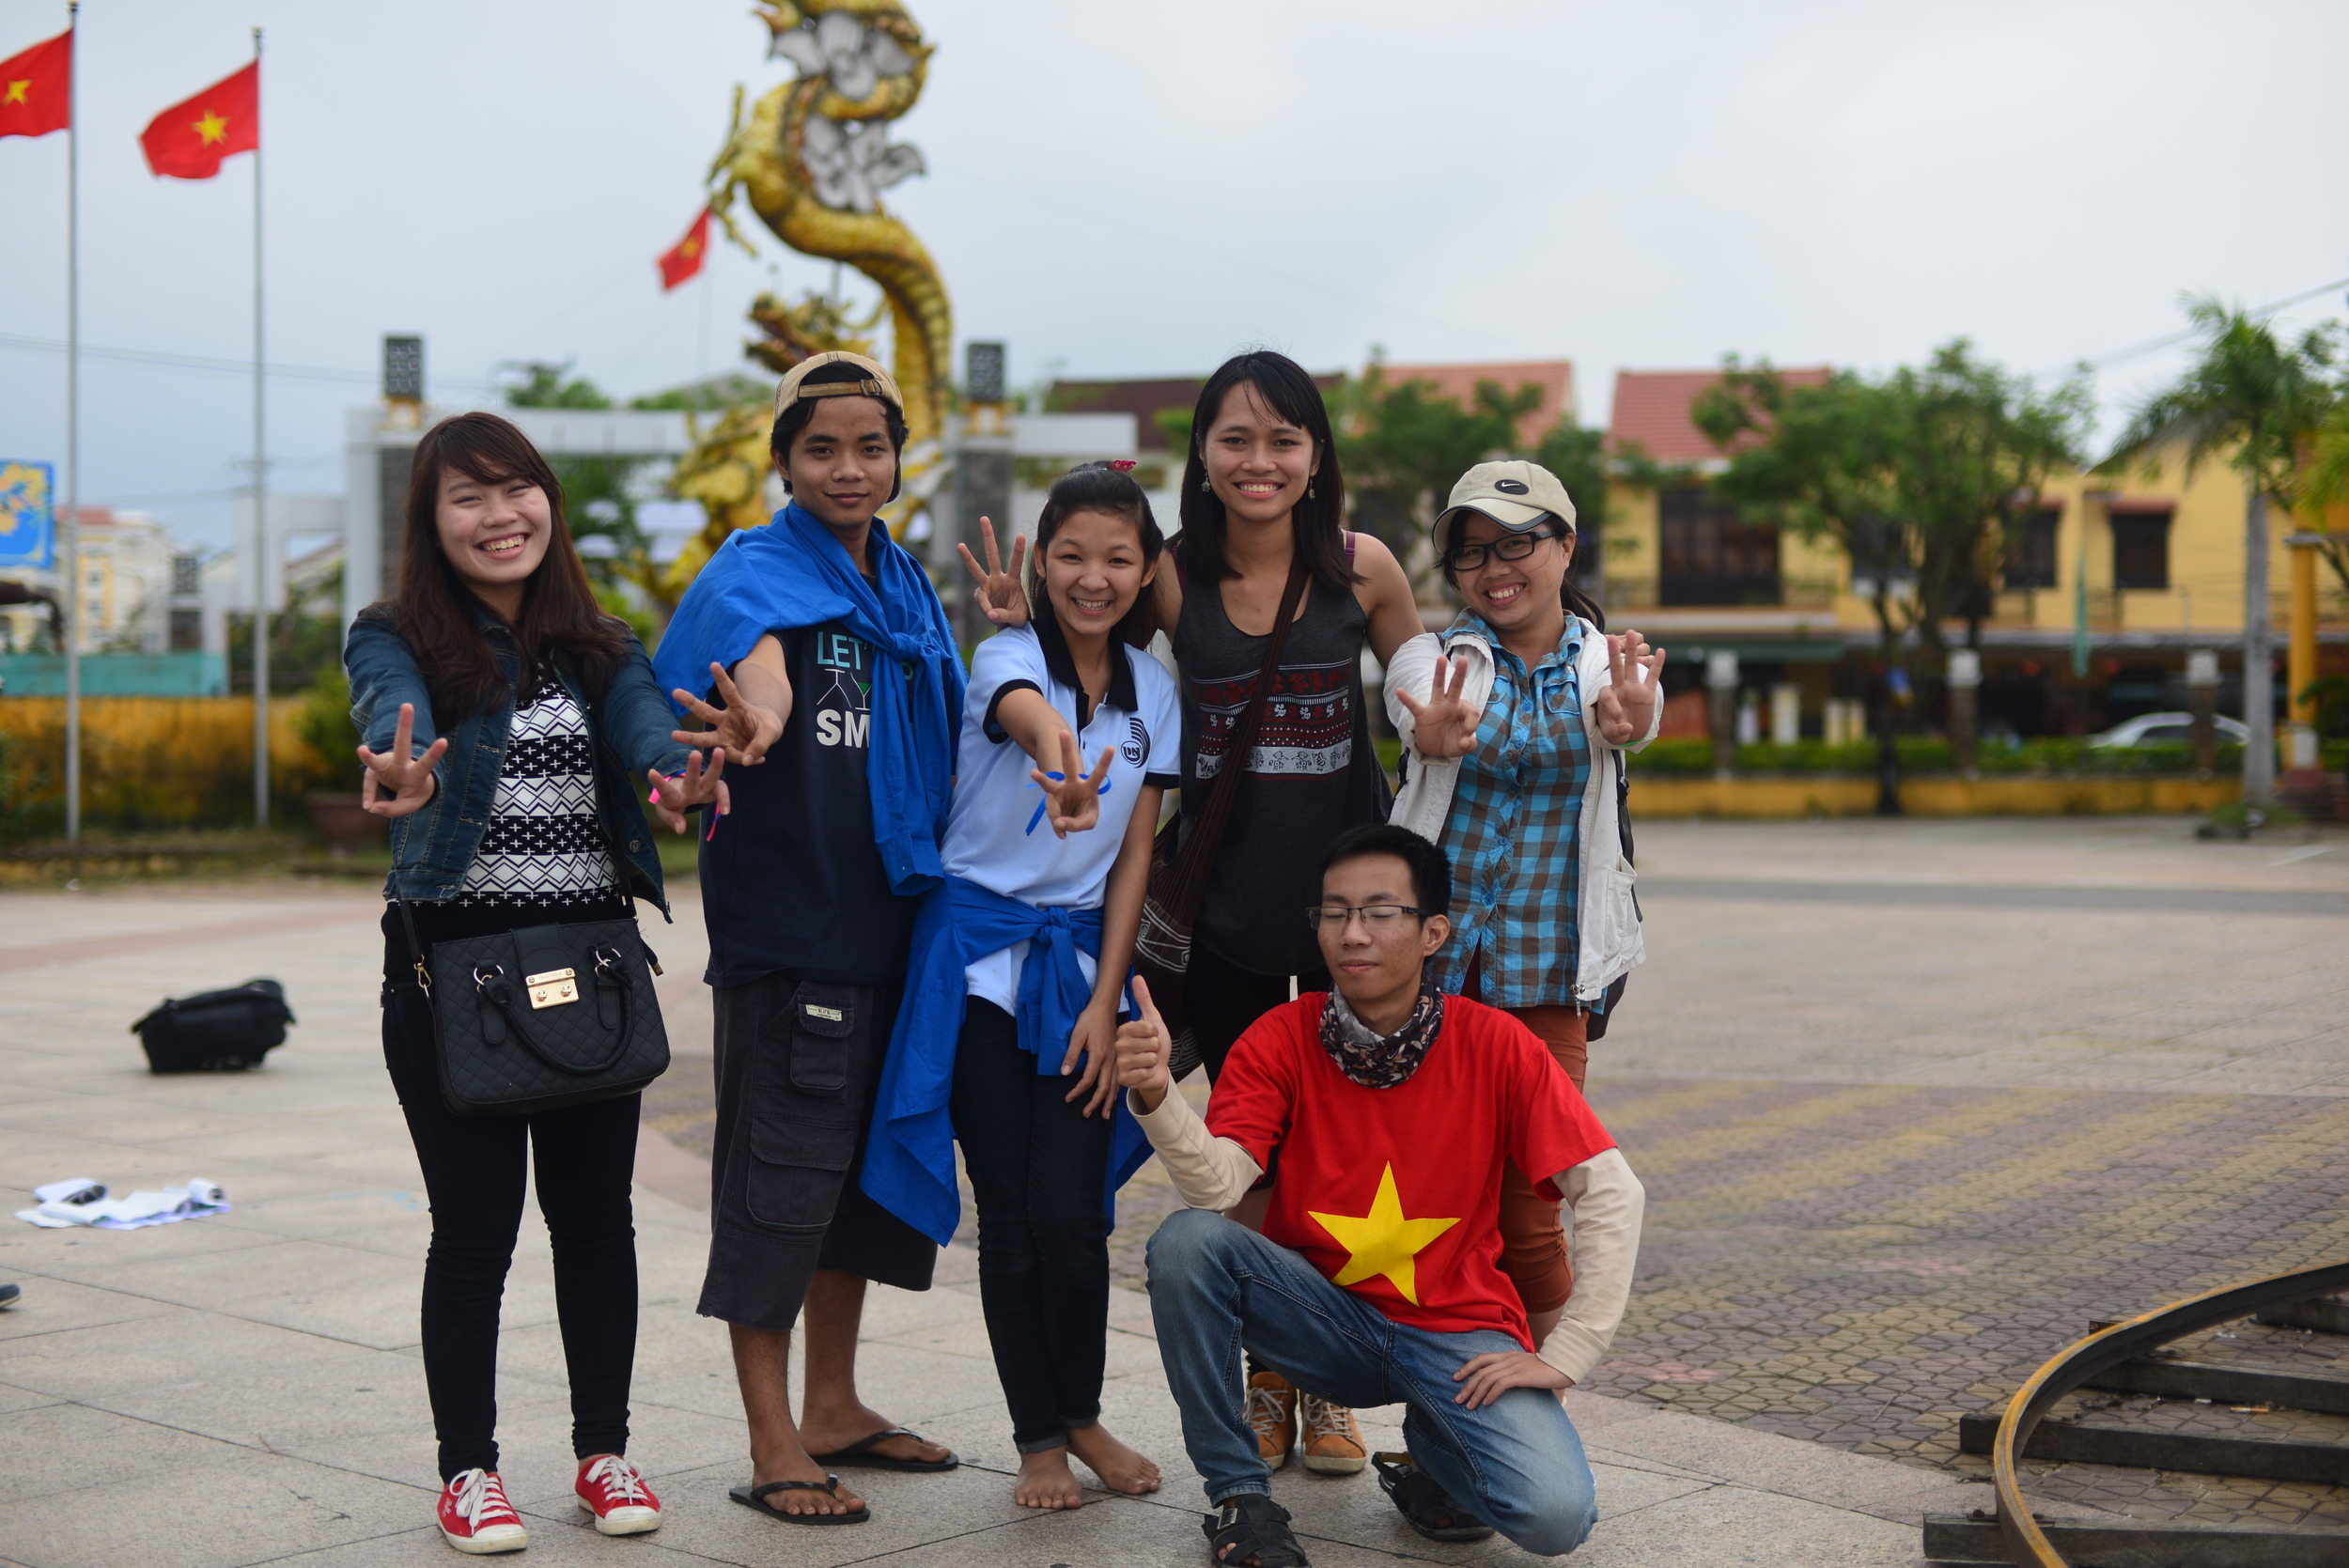 The winning group